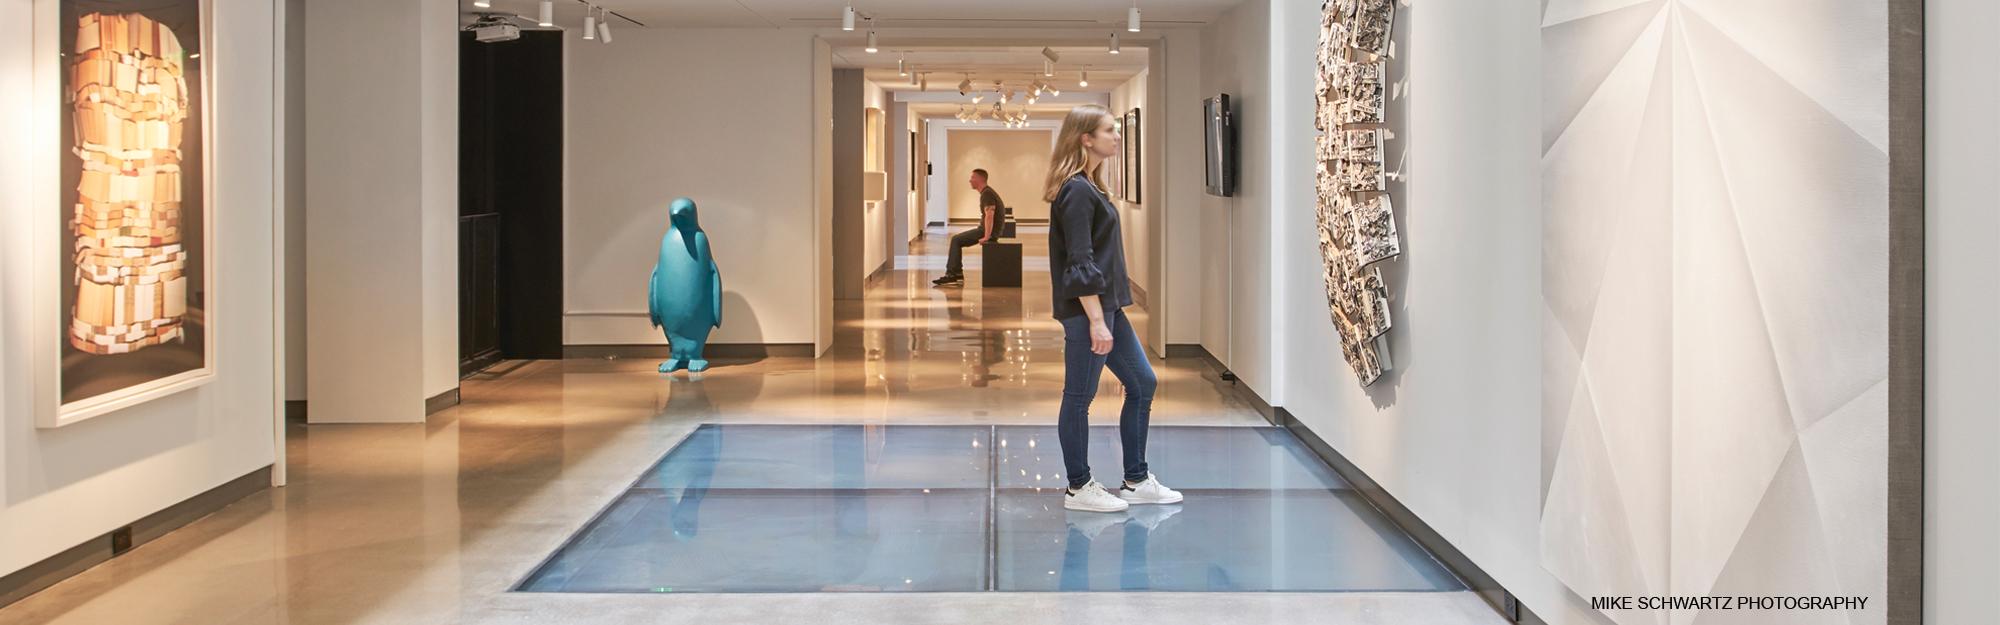 21C-Museum-GPX-FireFloor-Fire-Resistive-Glass-Floor